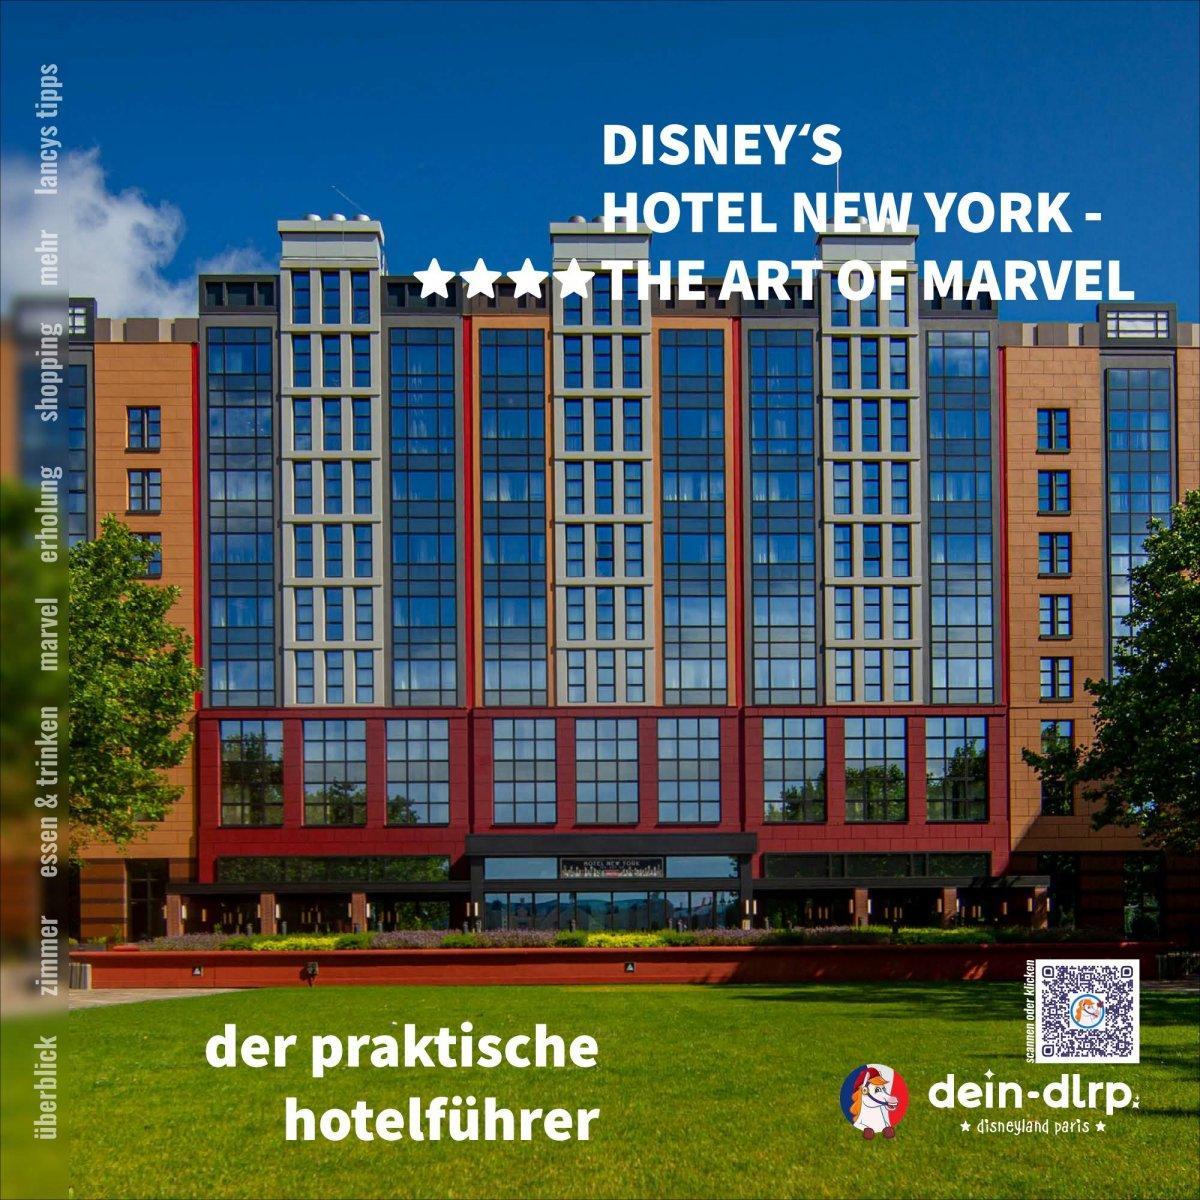 disneys-hotel-new-york-the-art-of-hotel-fuehrer_01.jpg